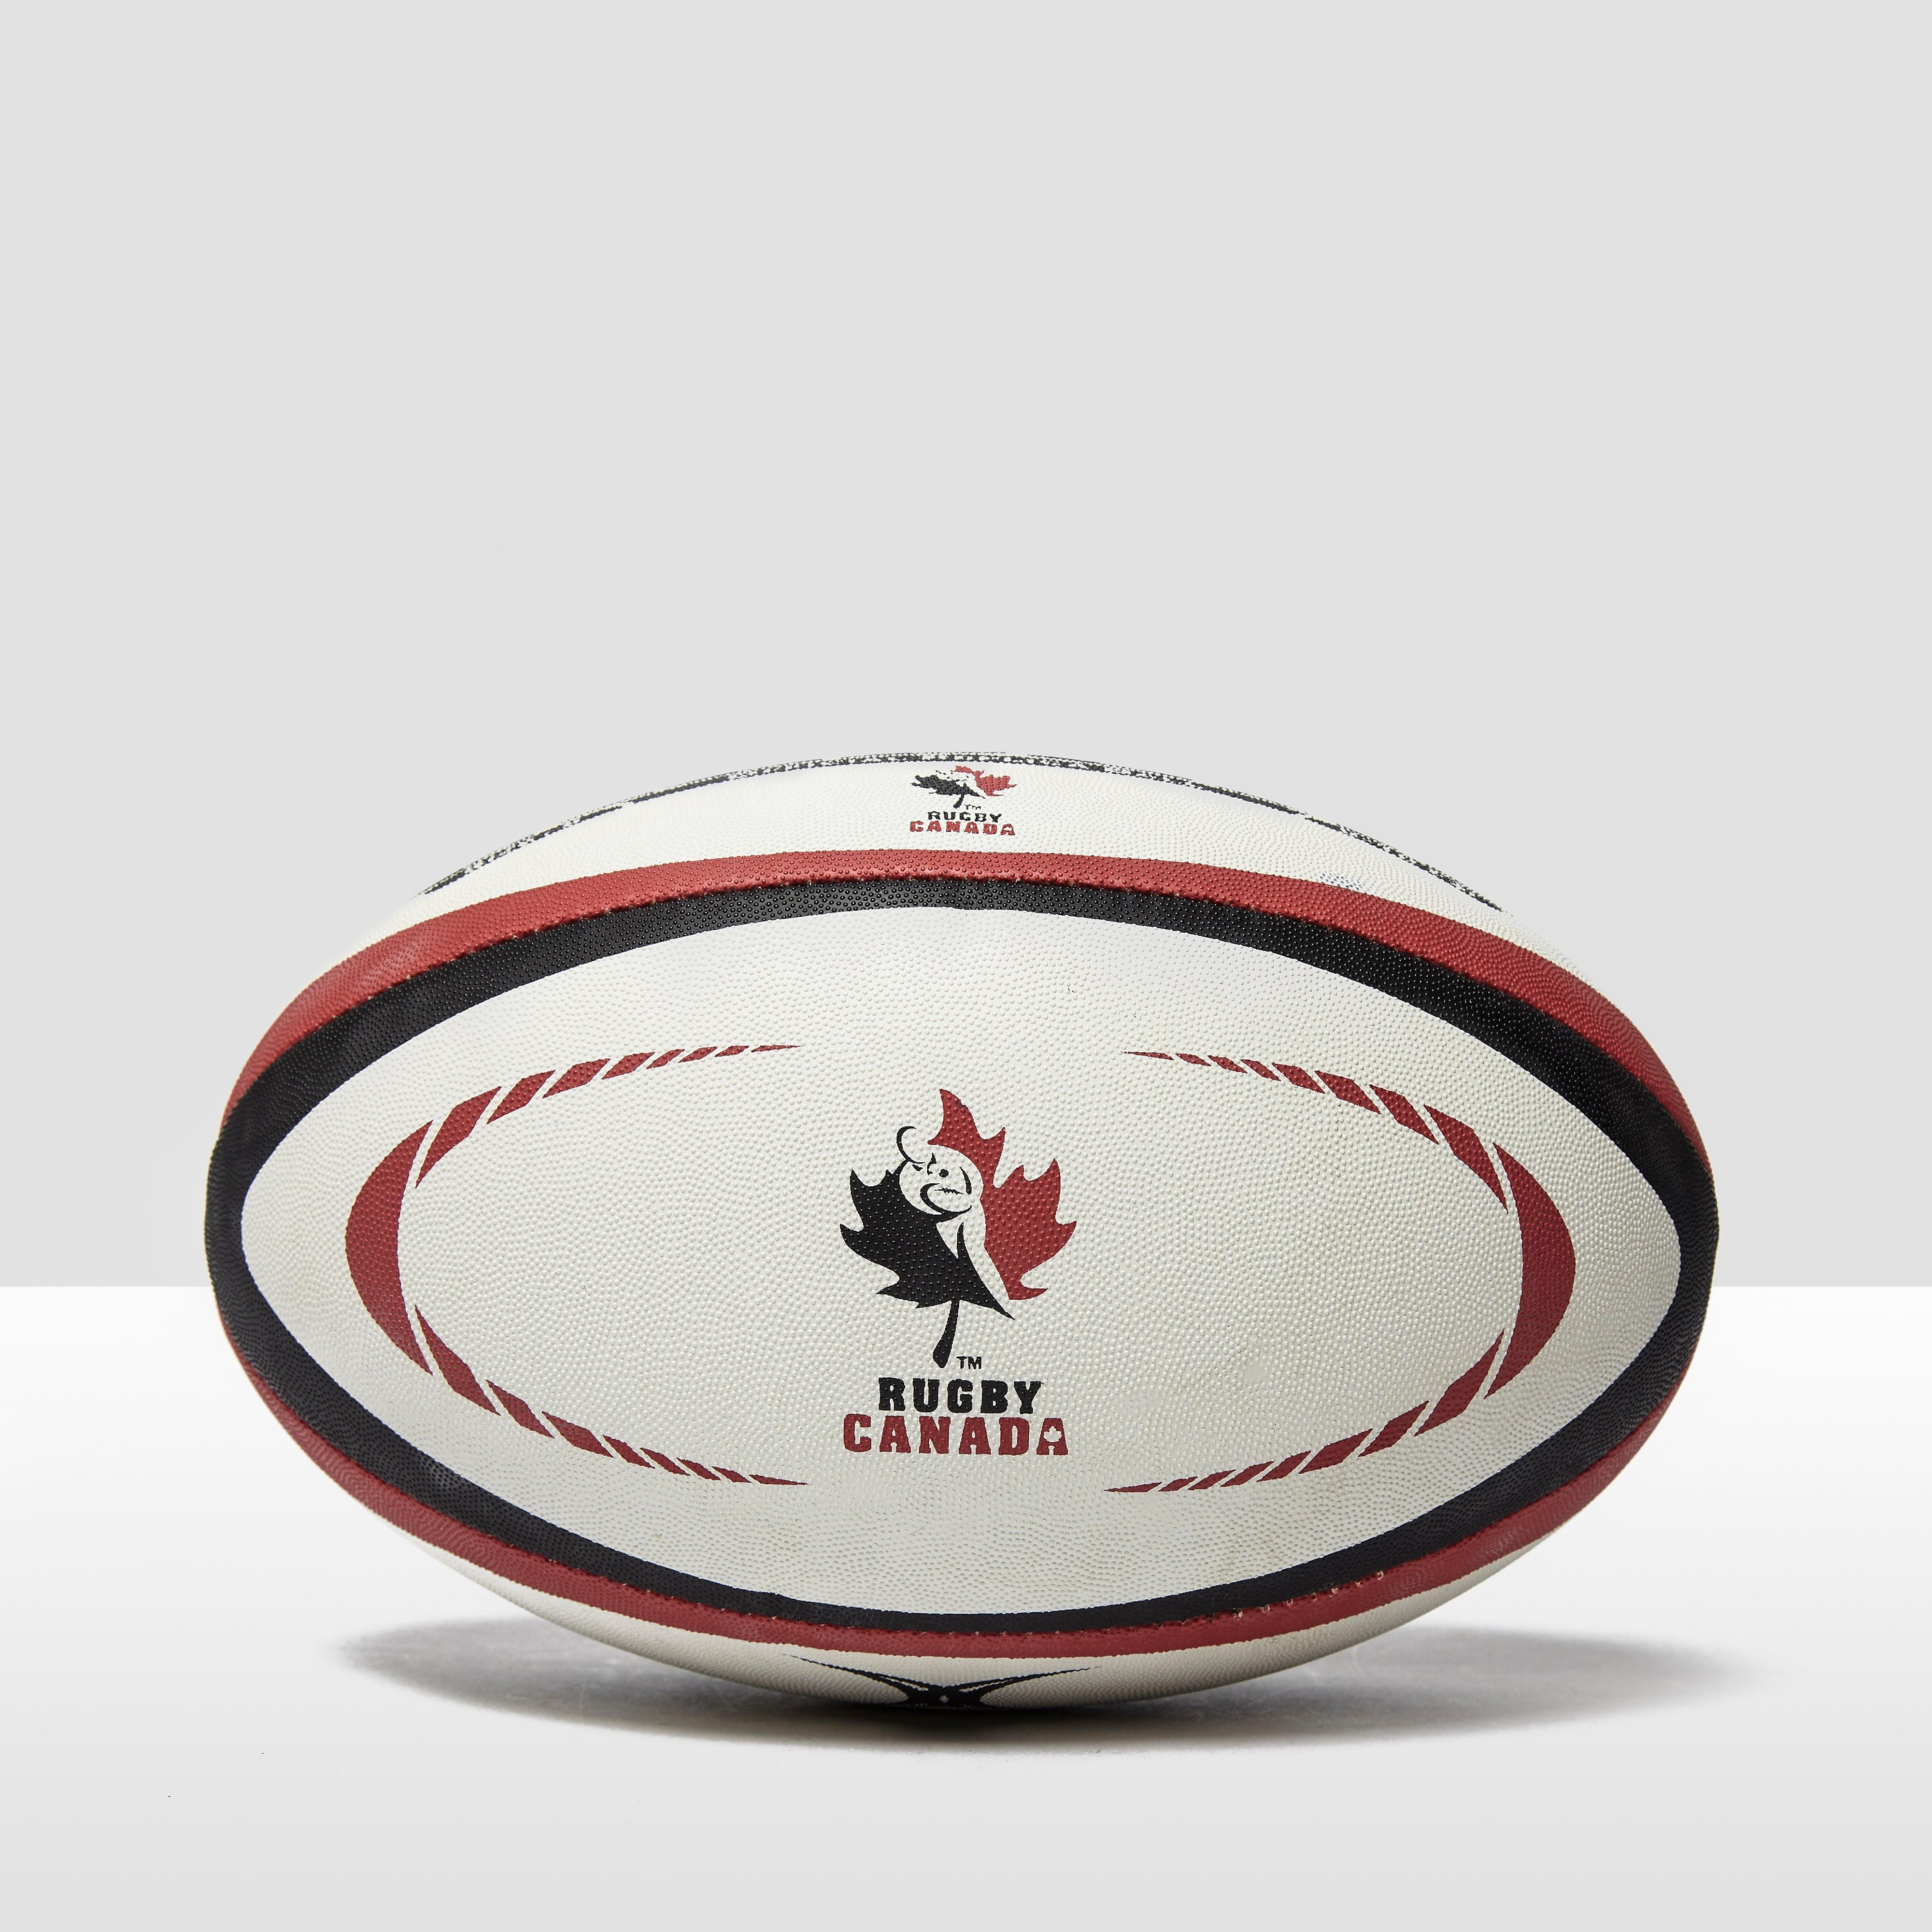 Gilbert Canada International Replica Rugby Ball